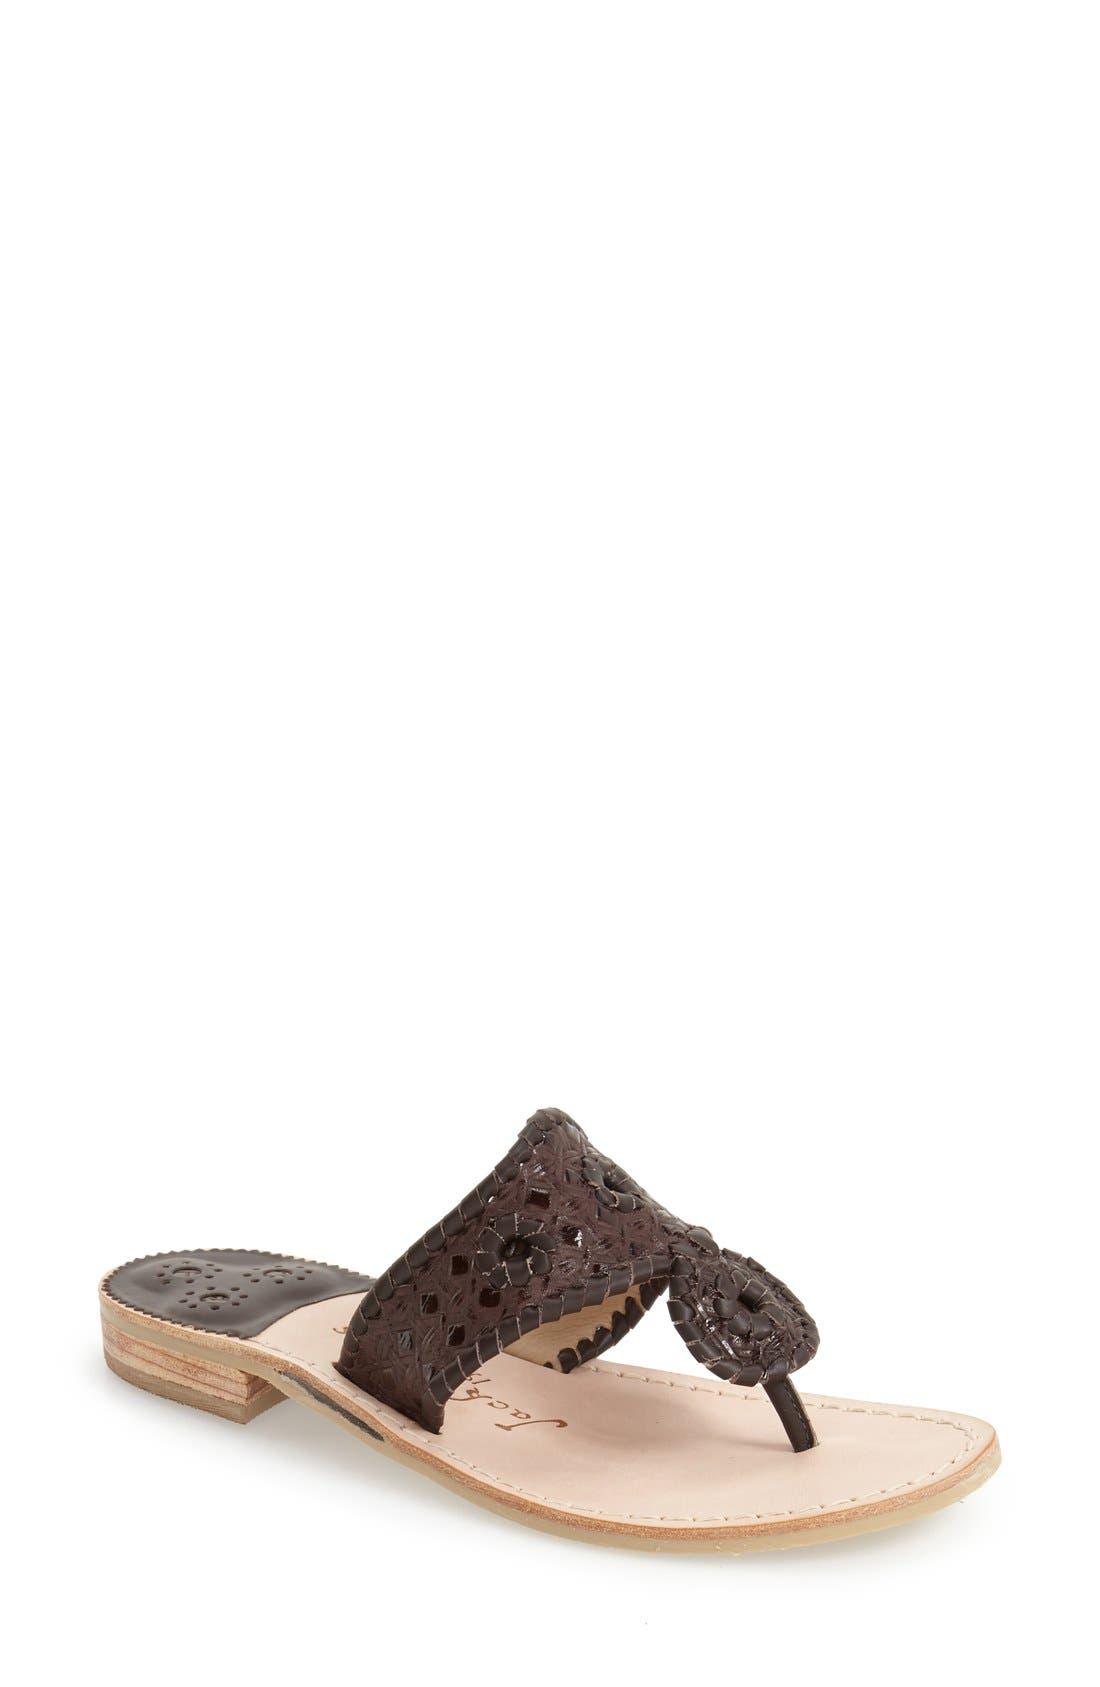 'Tyler' Sandal,                         Main,                         color, Dark Espresso